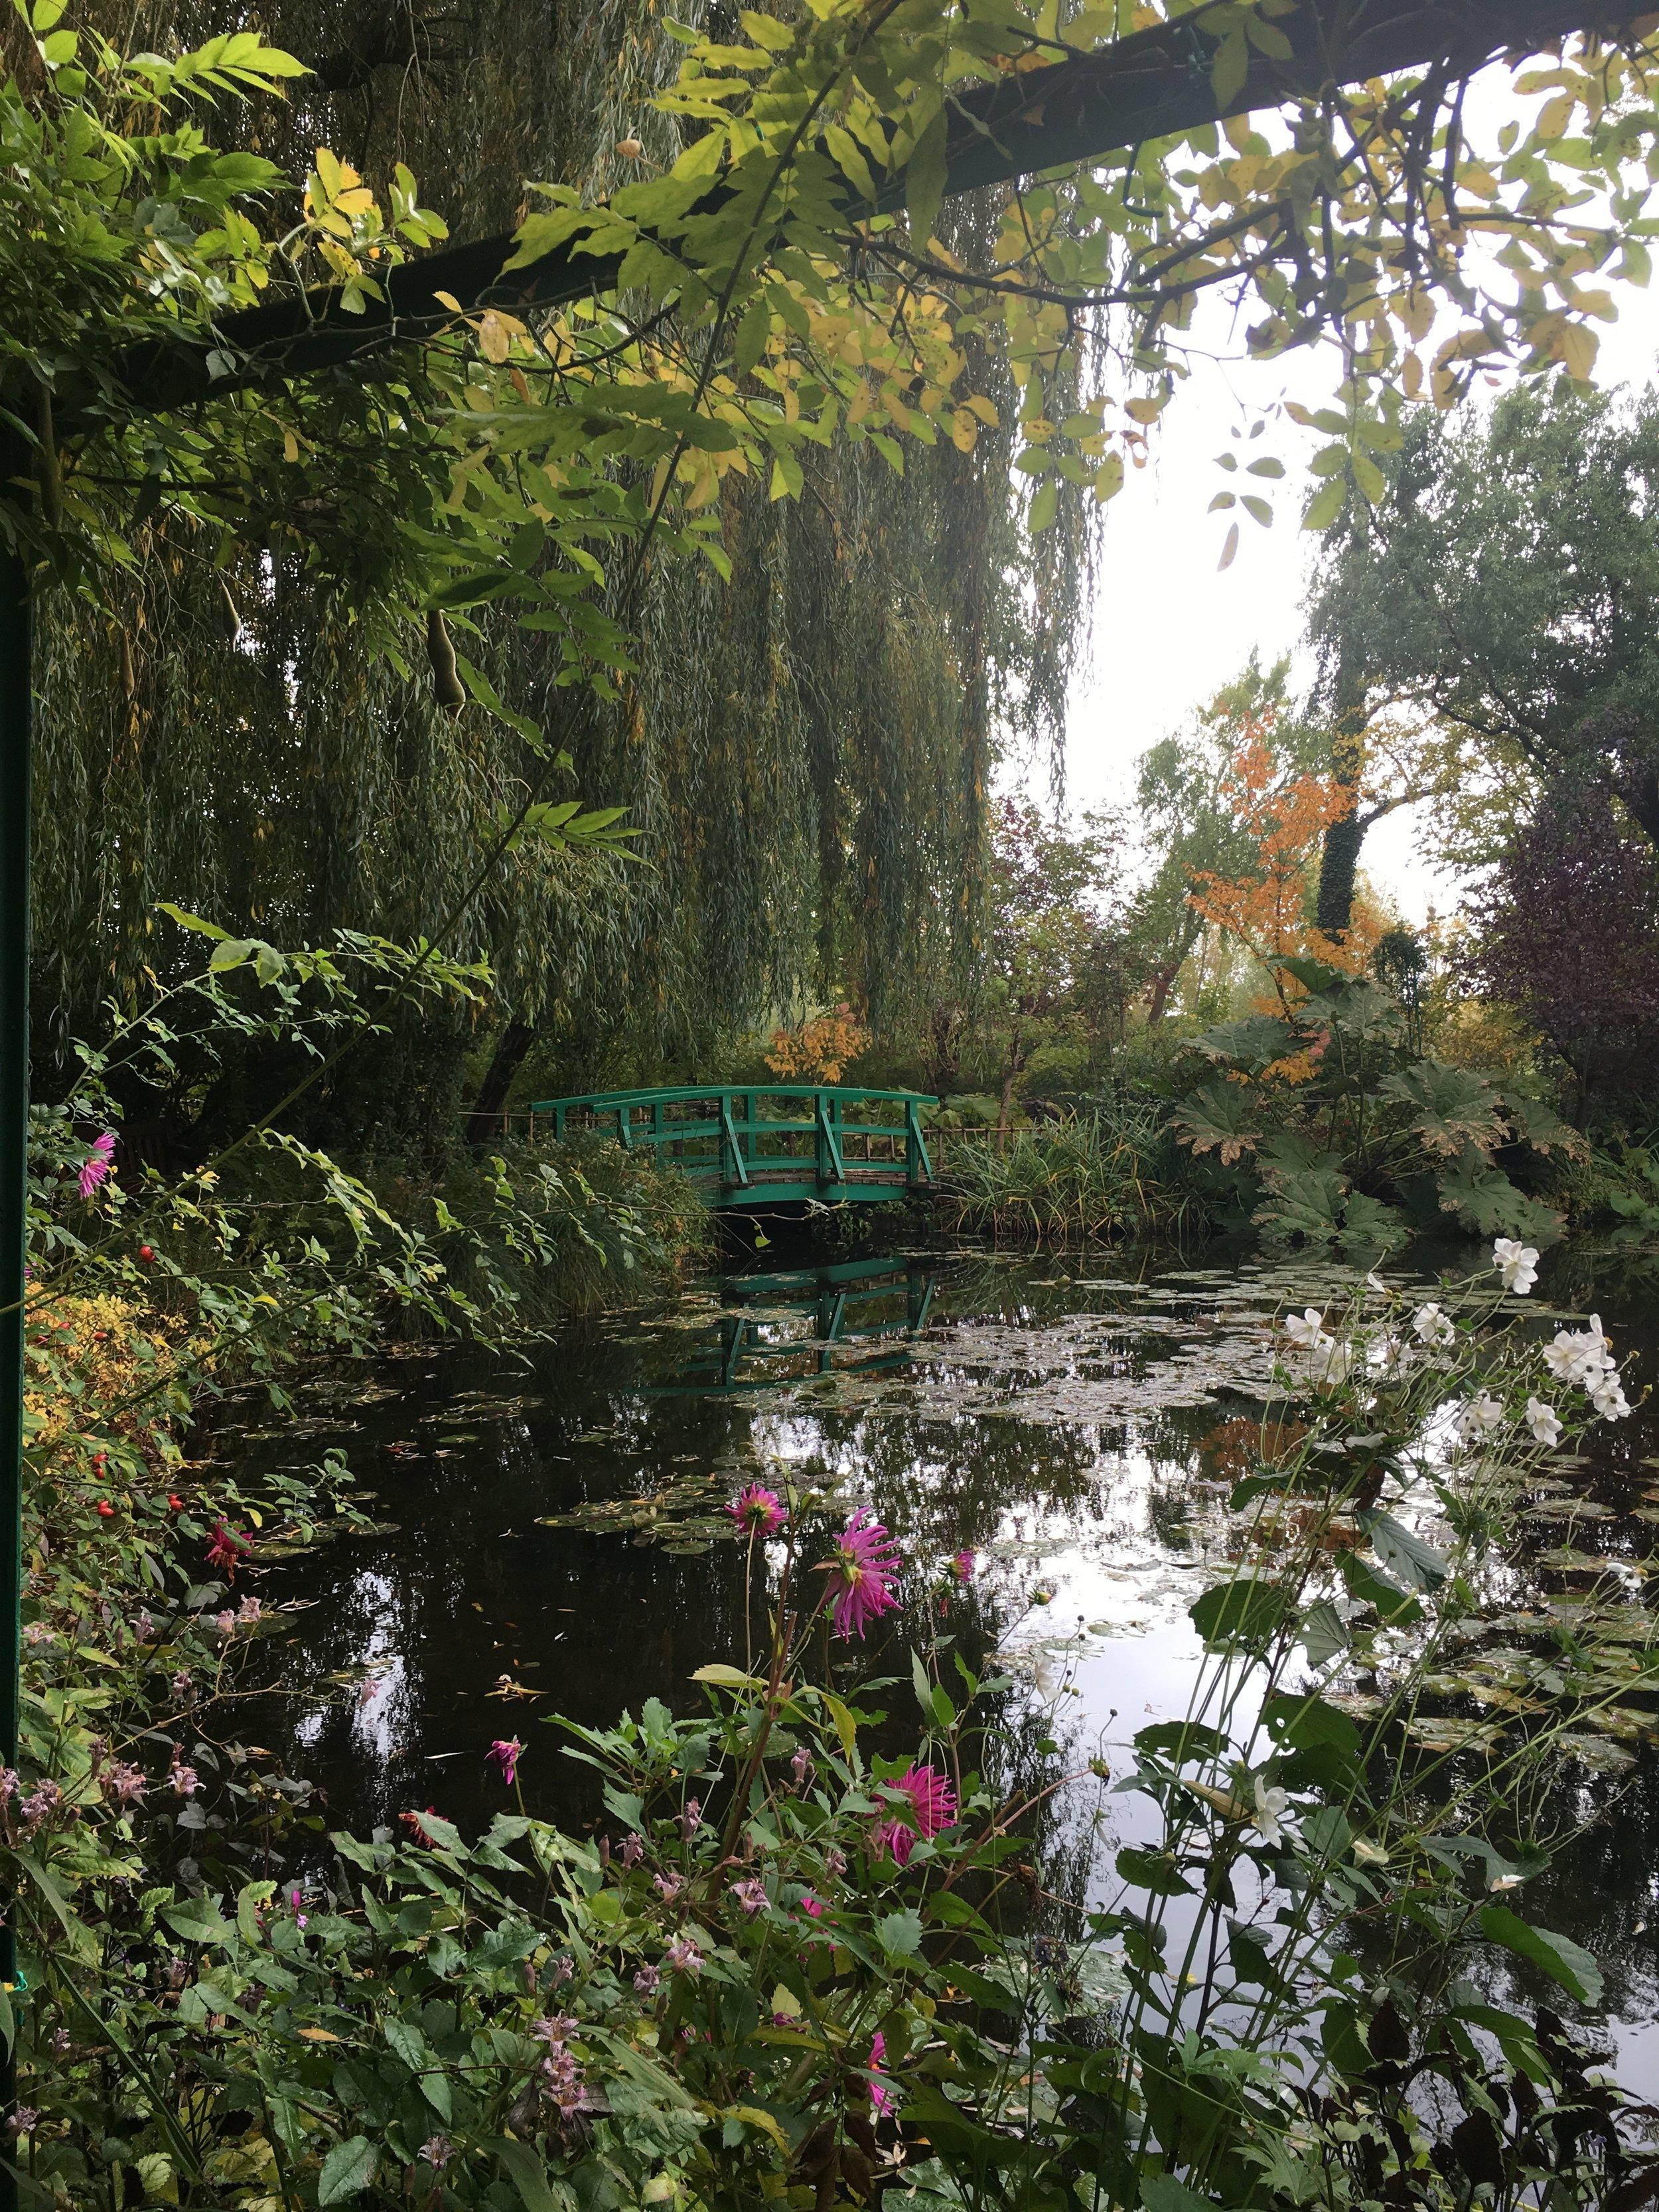 Monet's Garden - before